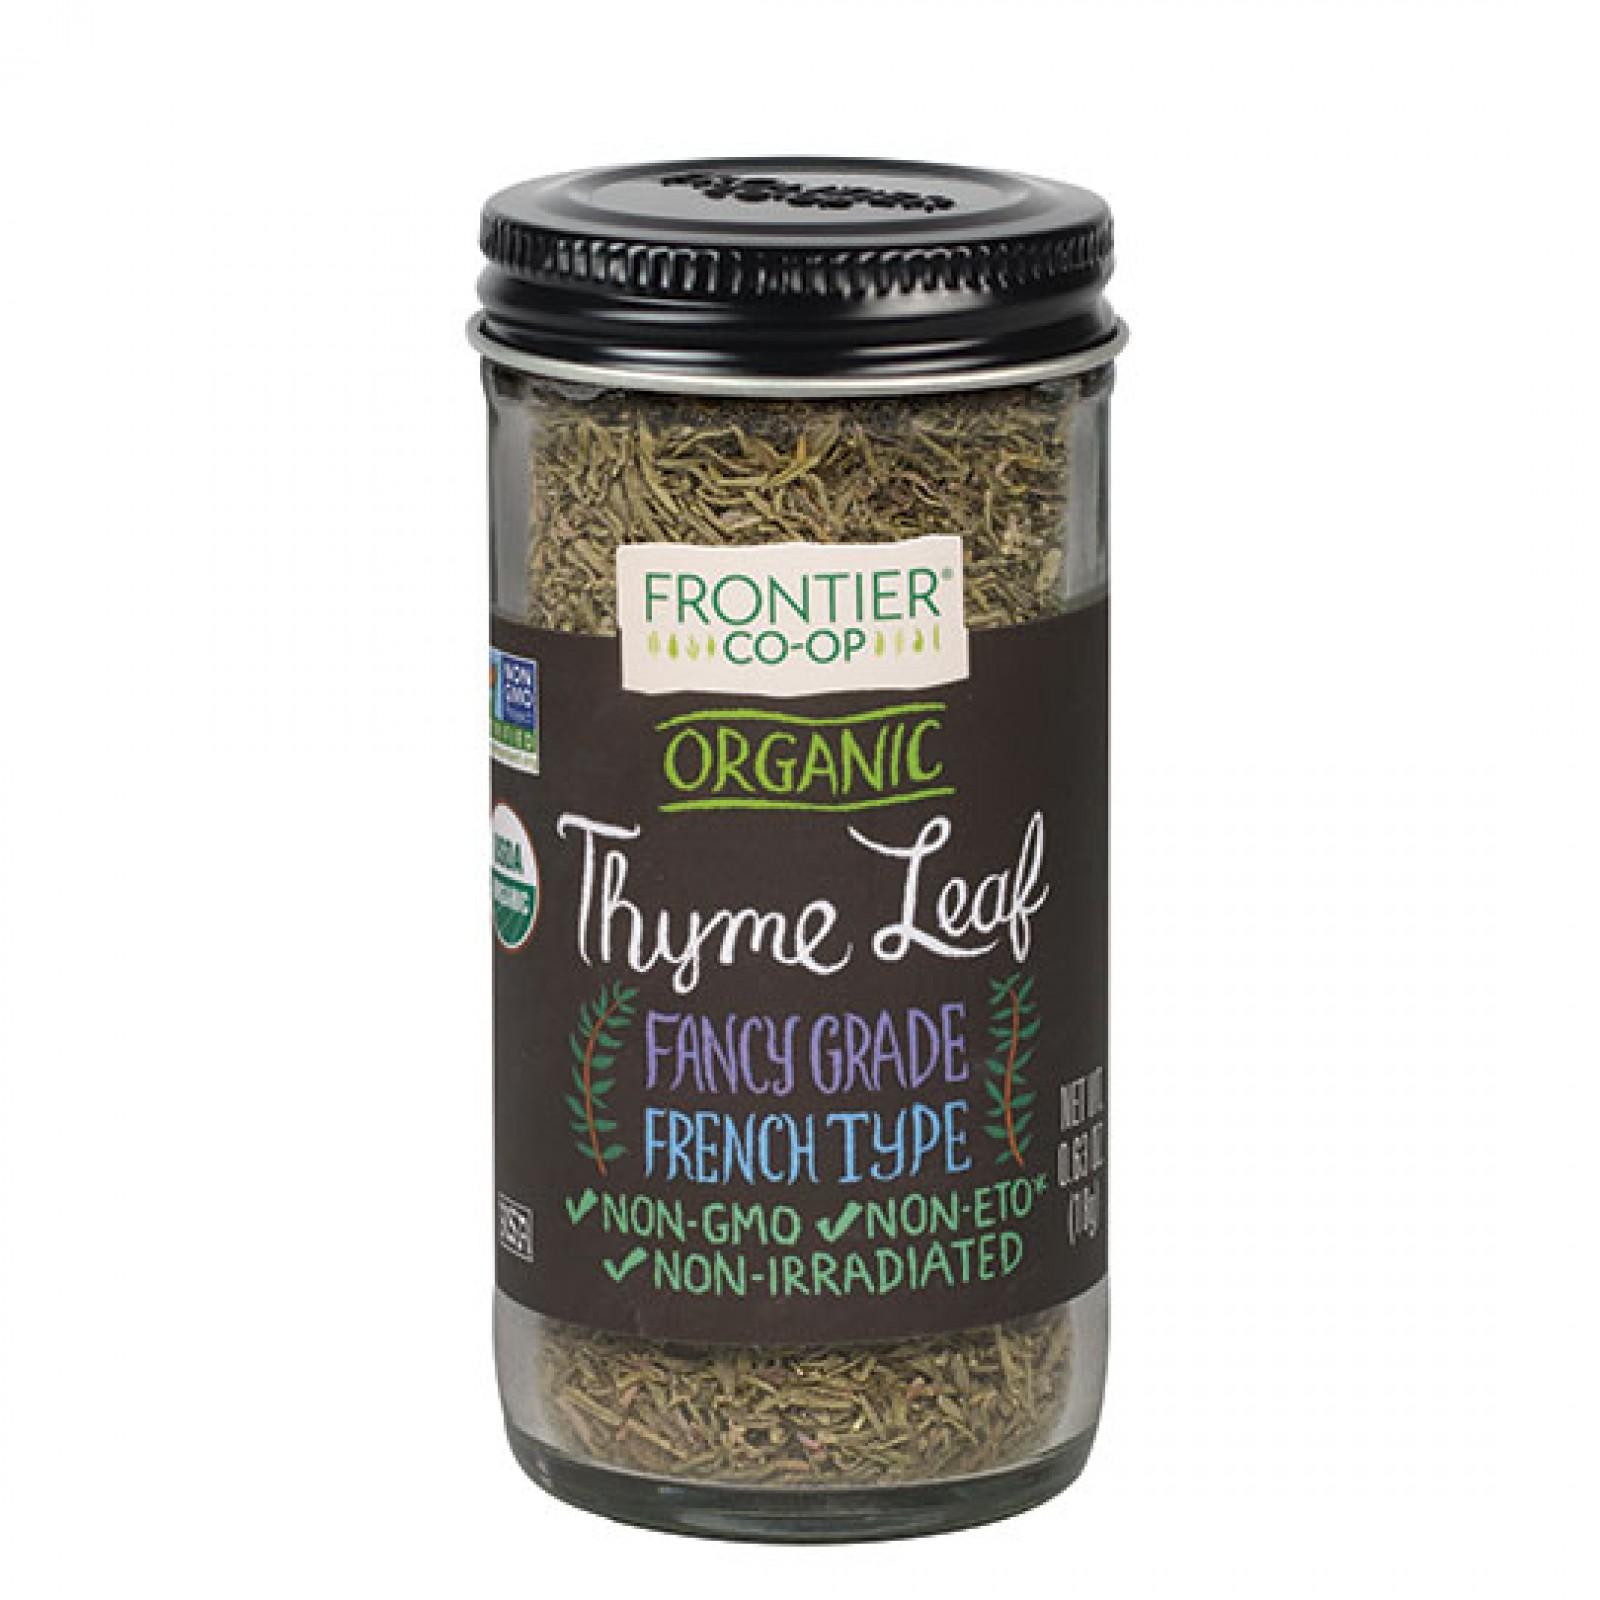 Frontier Herb Whole Organic Thyme Leaf (1x8 Oz)